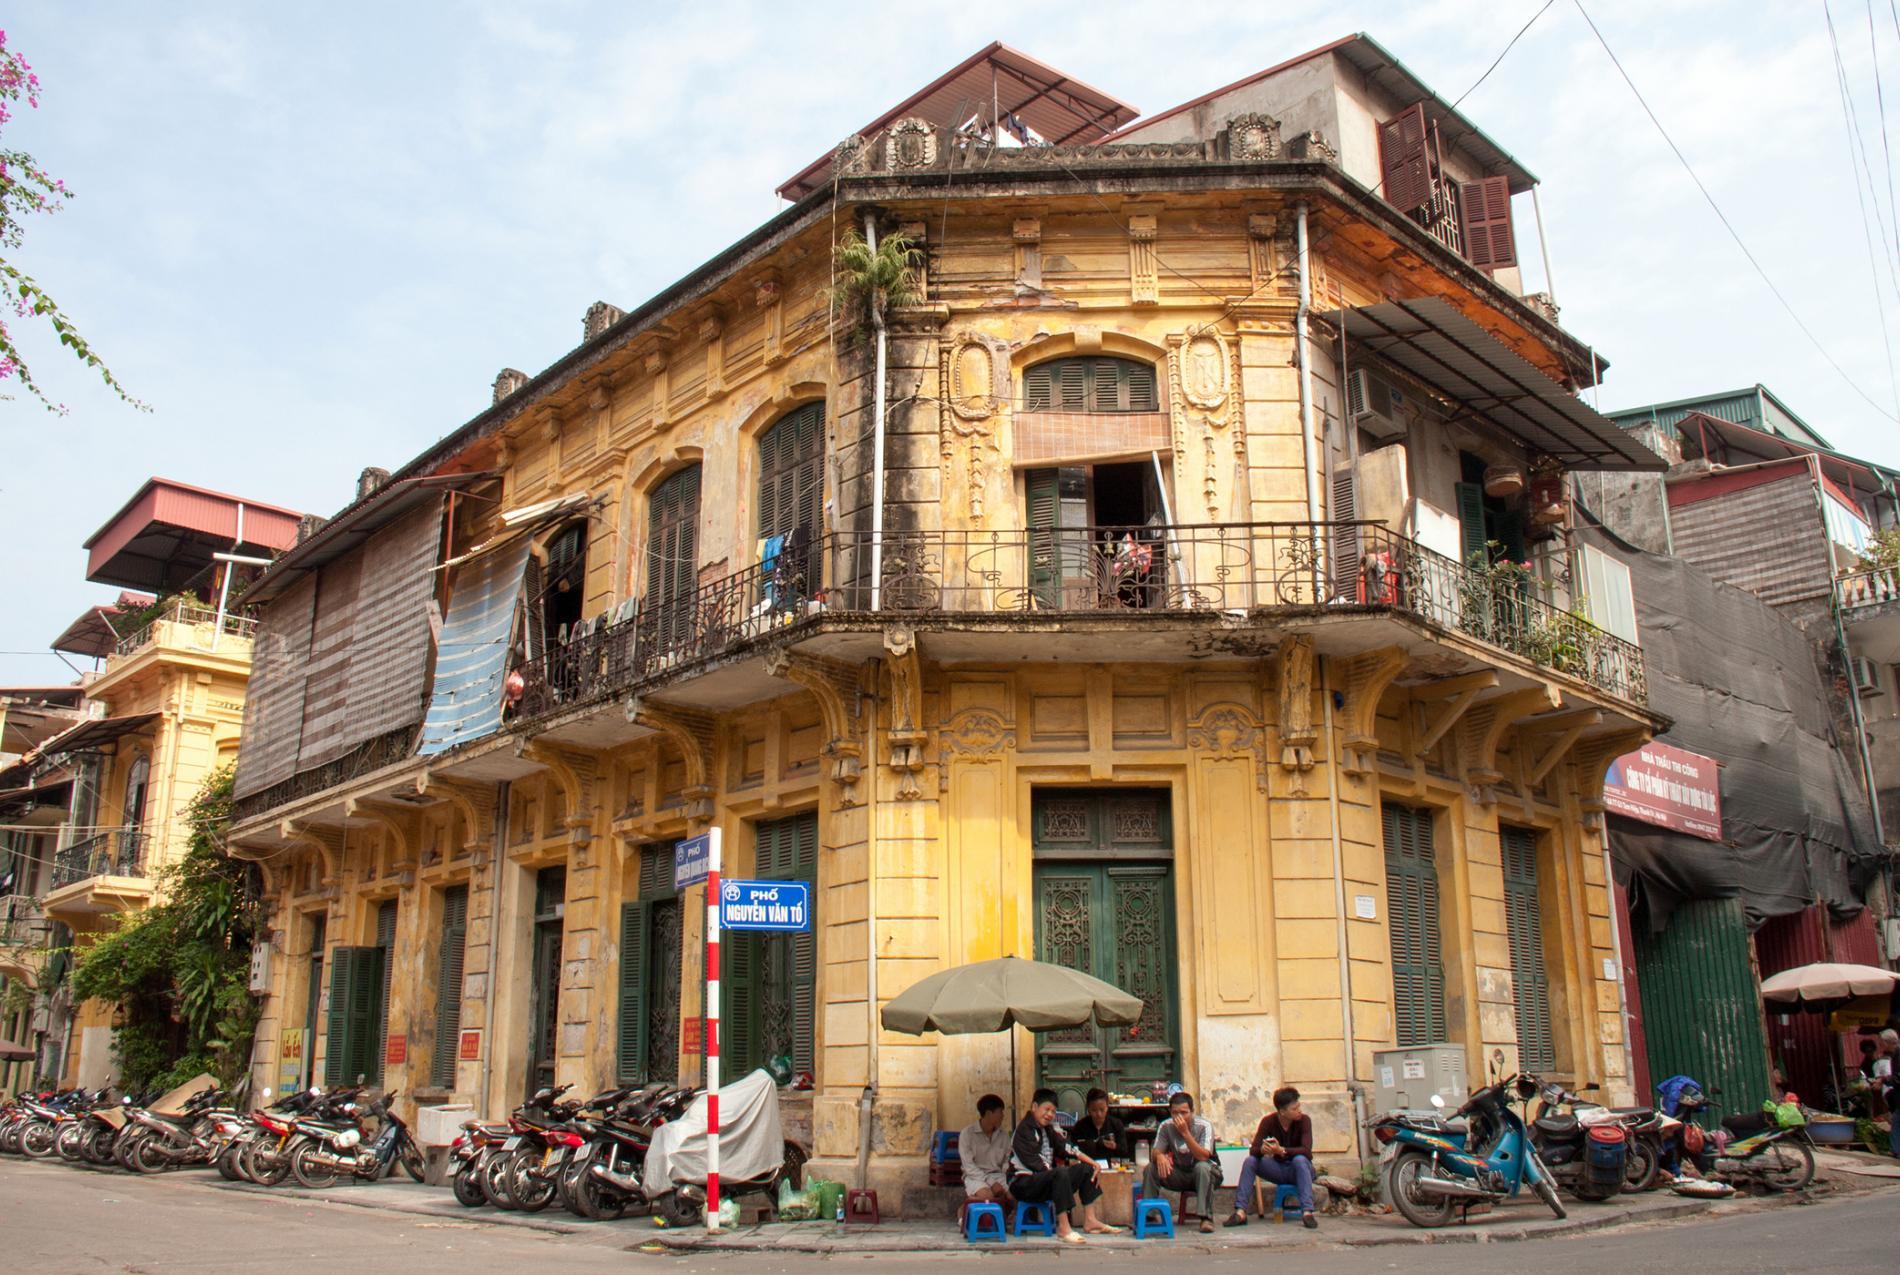 Voyage solidaire Vietnam-Cambodge : Vision du Monde - Photo 5